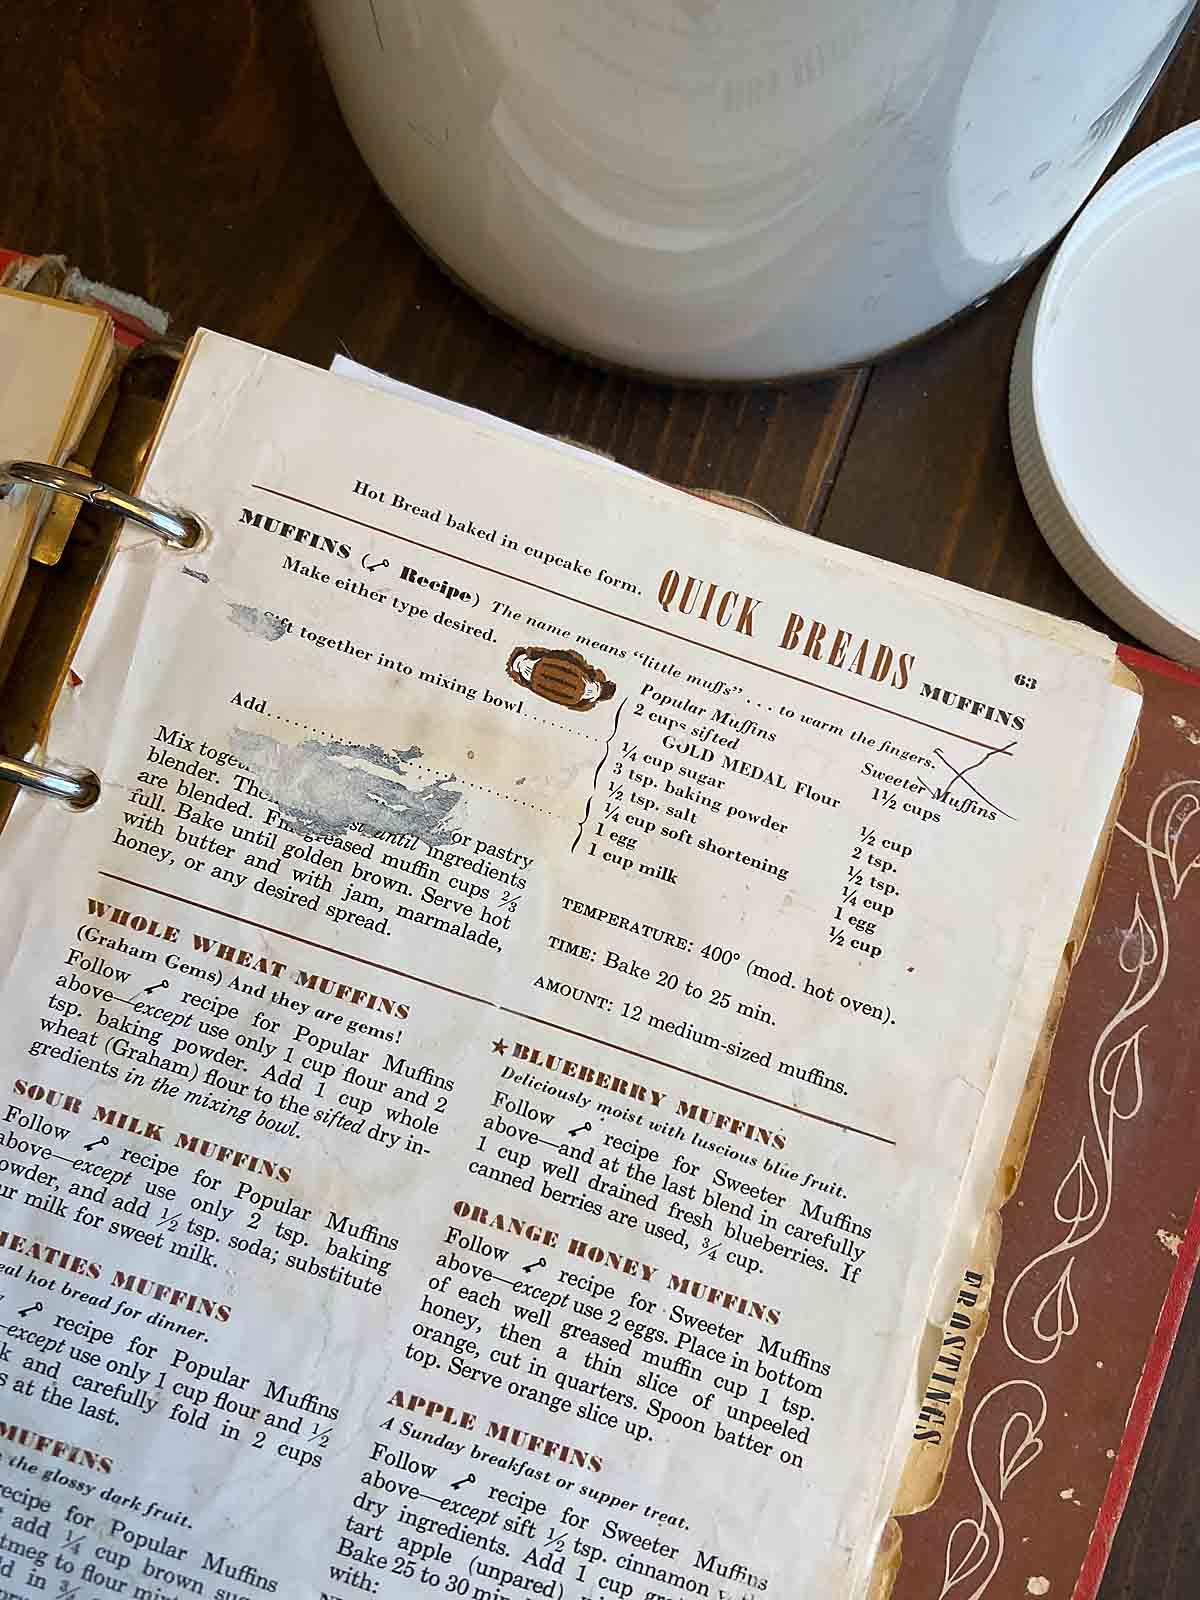 The original cookbook, all maarked up